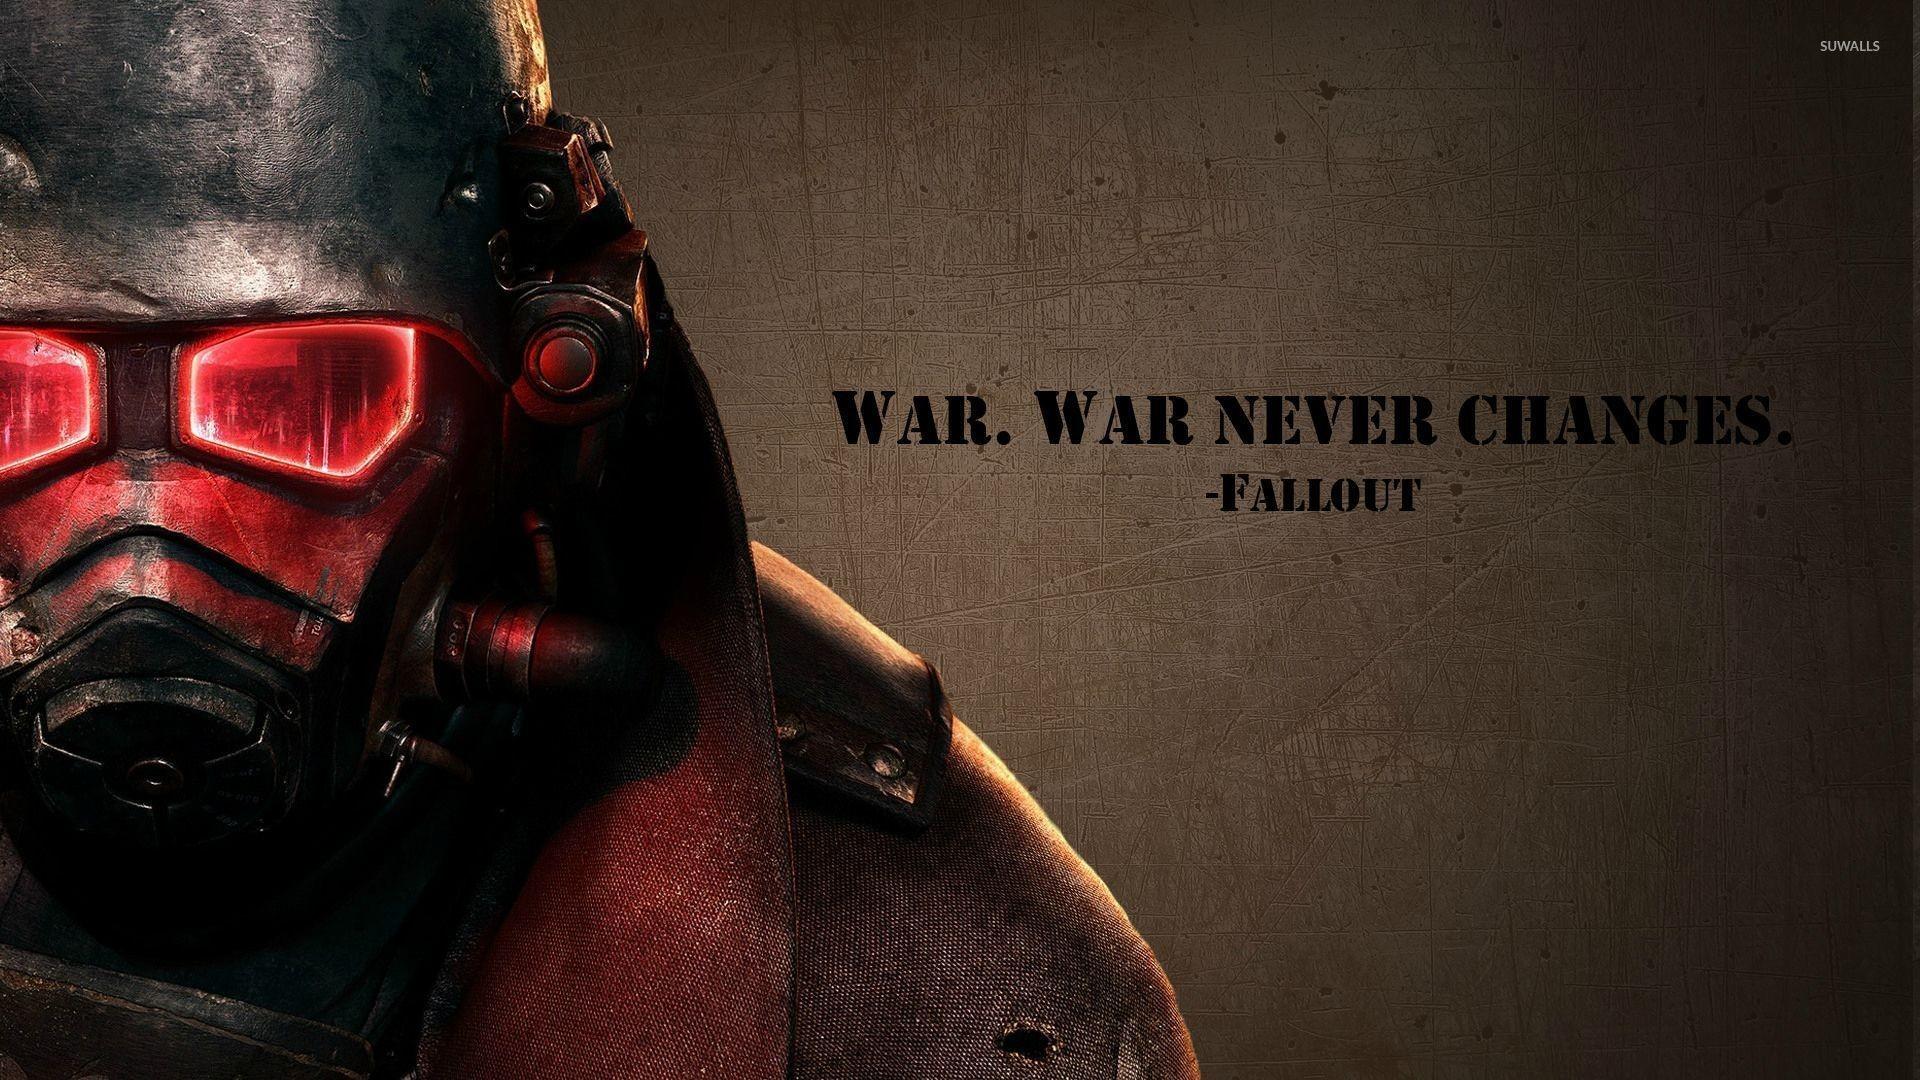 Res: 1920x1080, War never changes - Fallout wallpaper